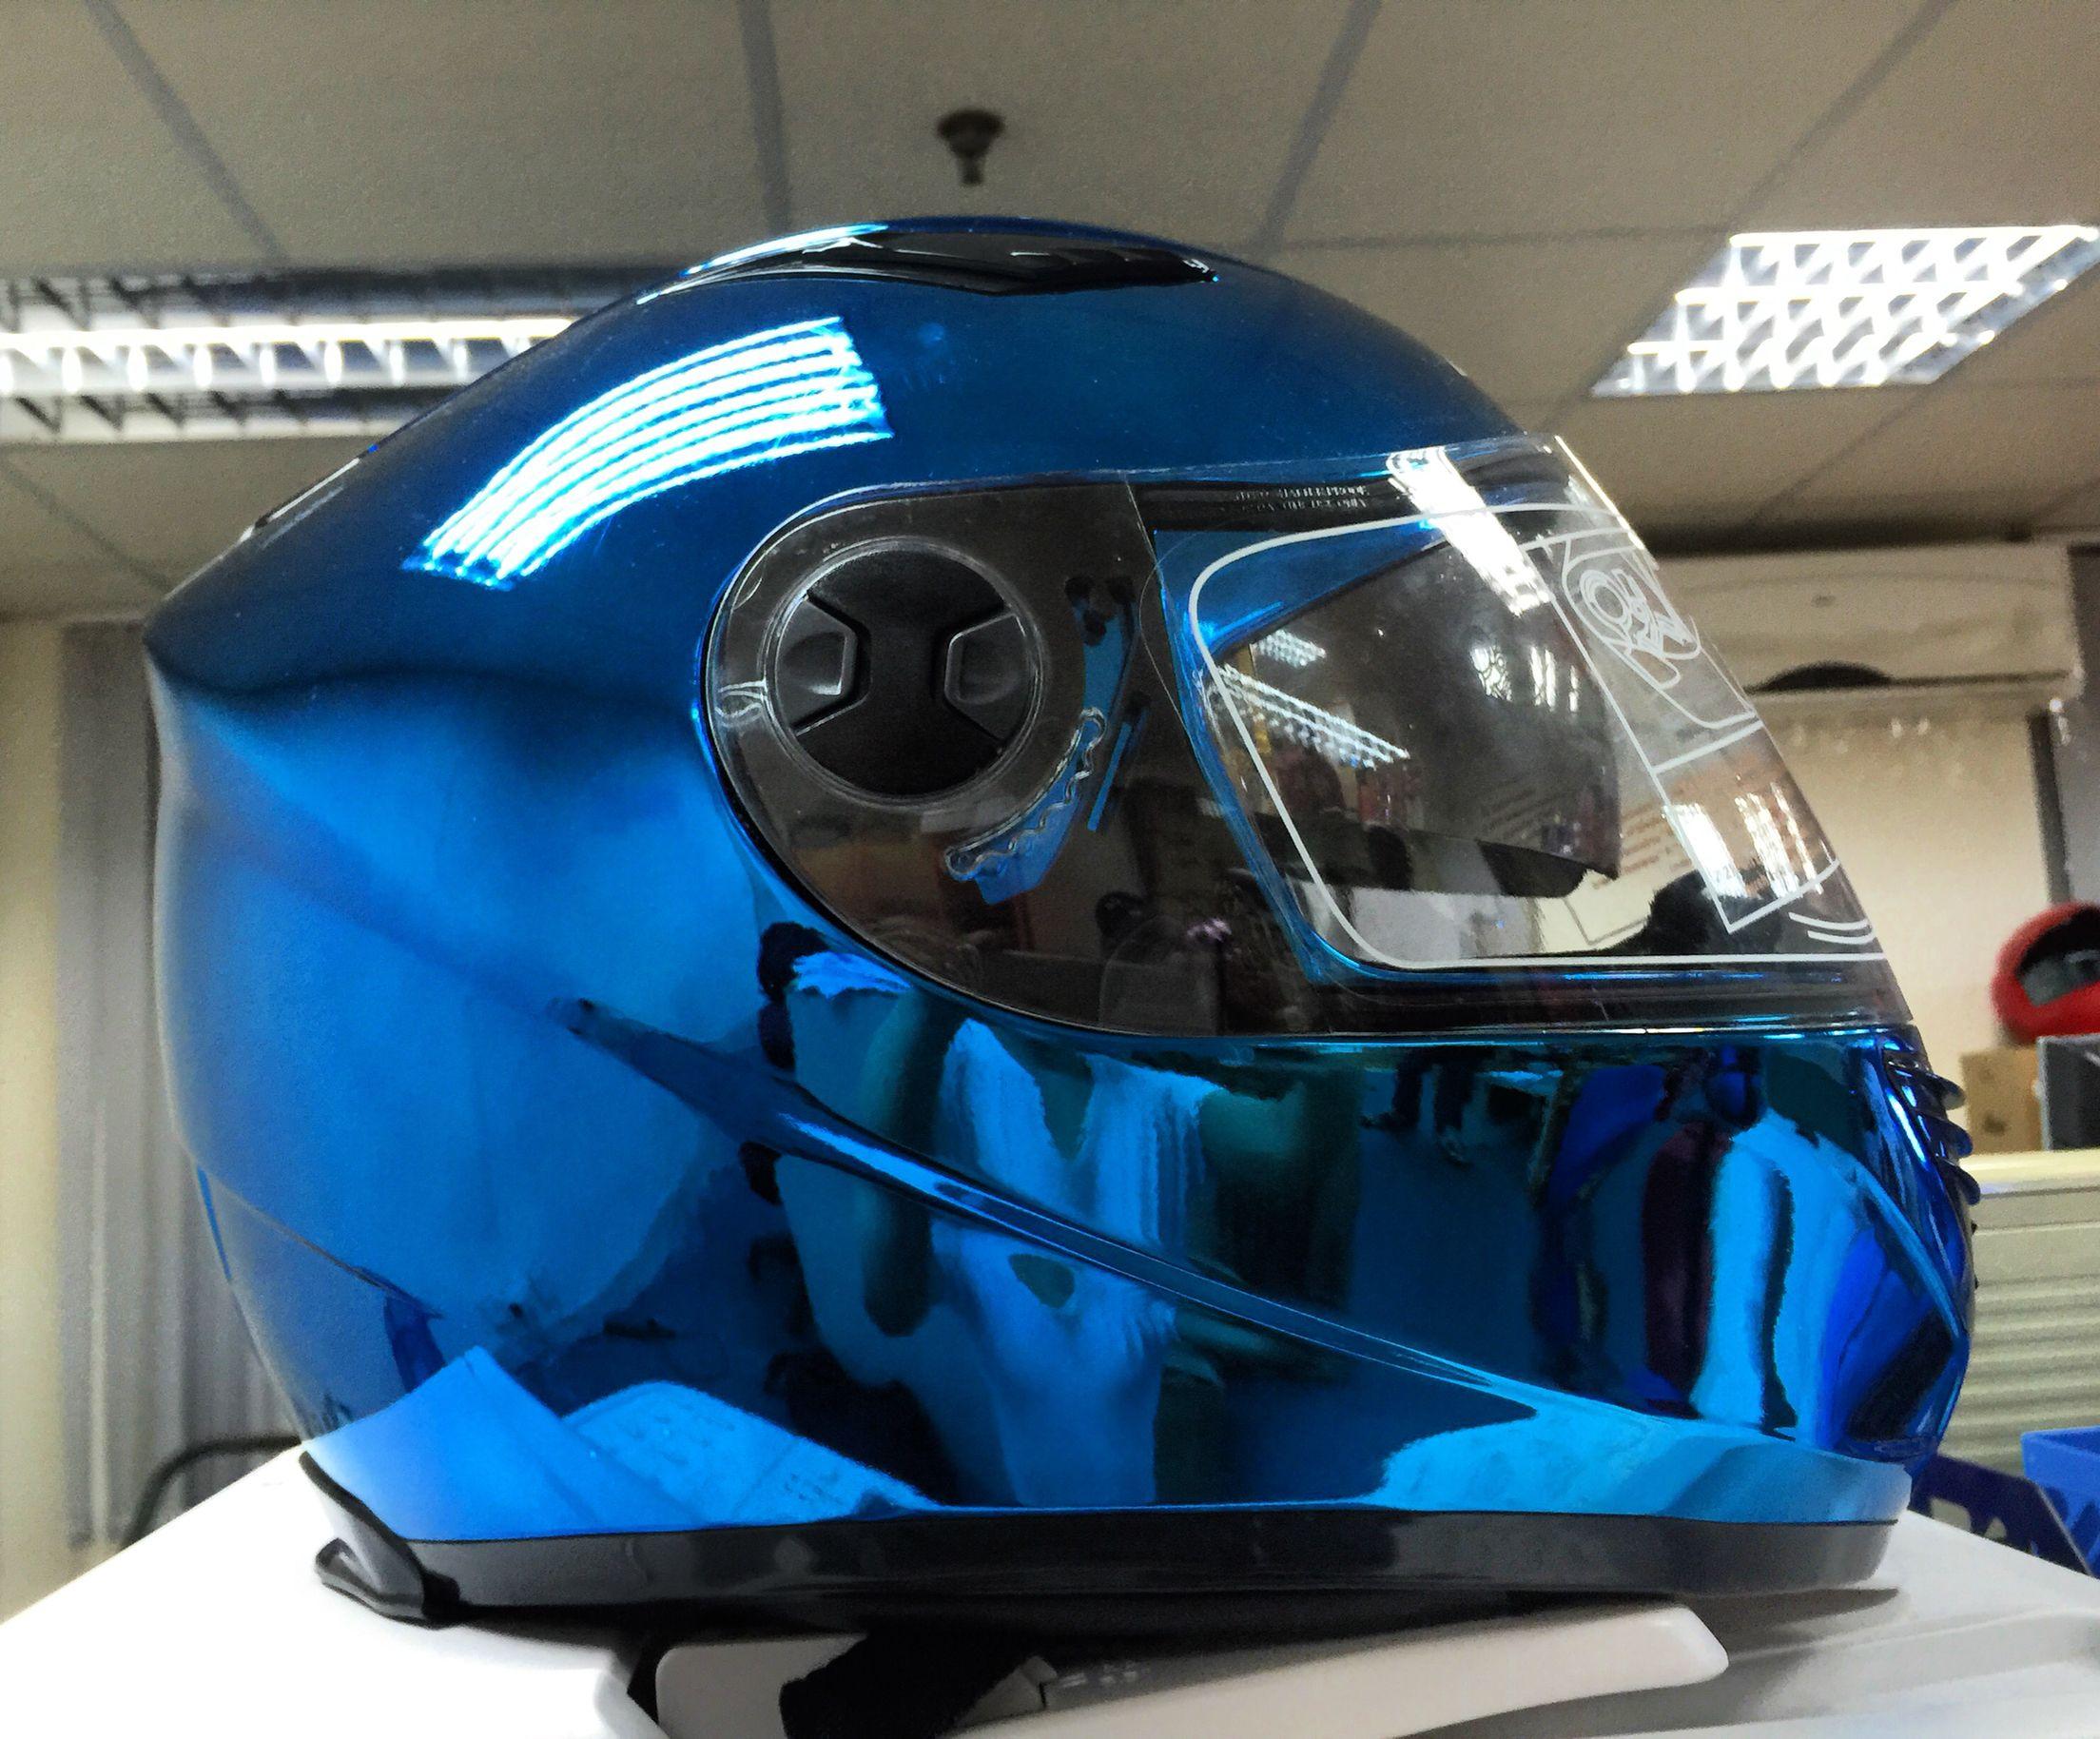 Google chrome themes yamaha - Masei 830 Blue Chrome Motorcycle Bike Harley Arai Ogk Yamaha Helmet Sales Maseihelmets